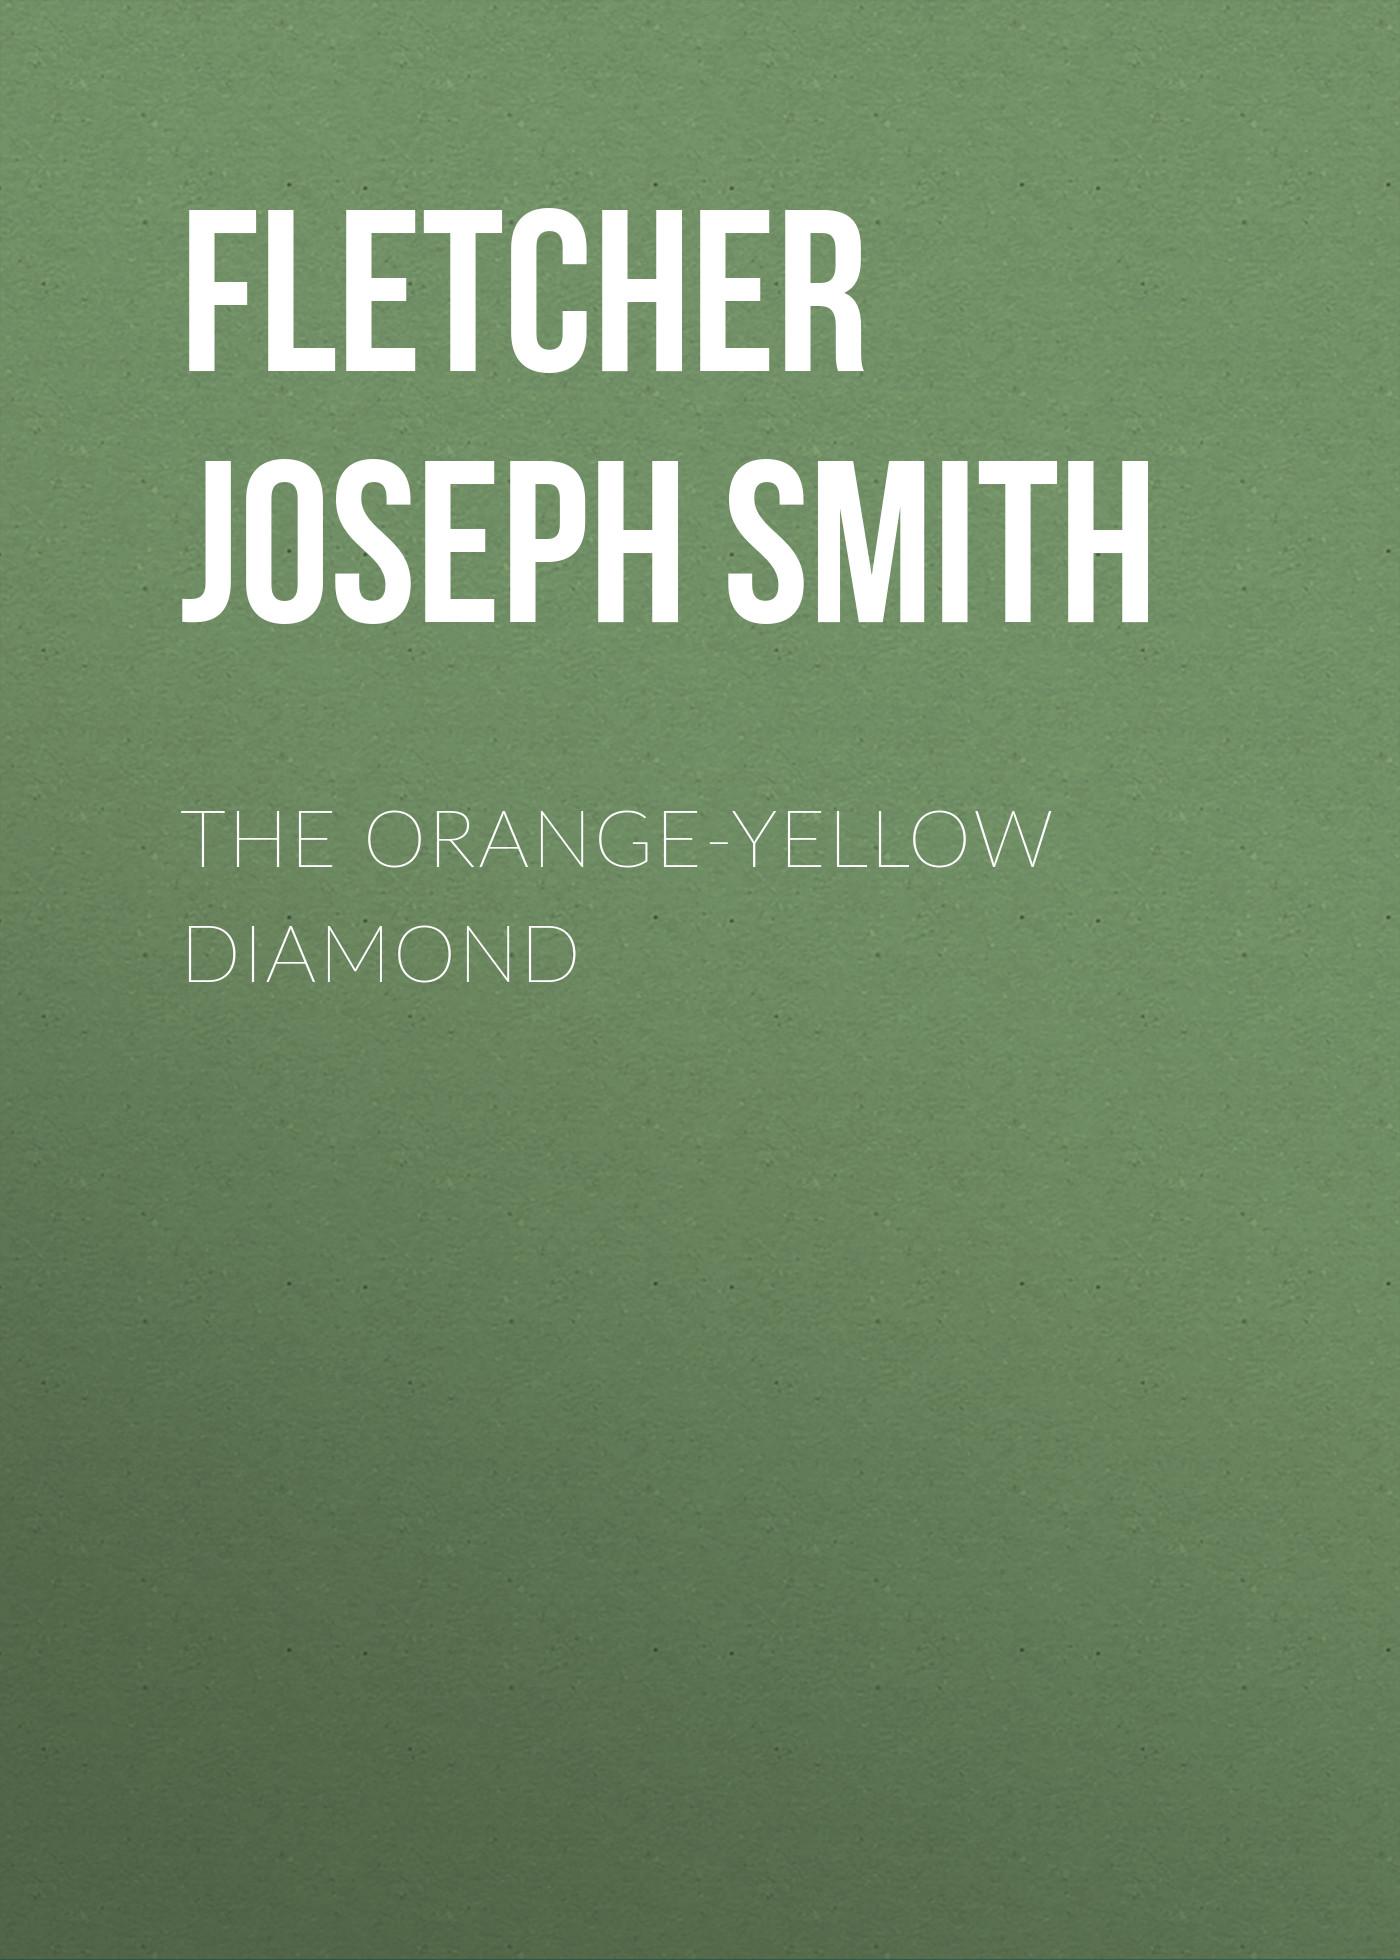 Fletcher Joseph Smith The Orange-Yellow Diamond fletcher joseph smith in the days of drake